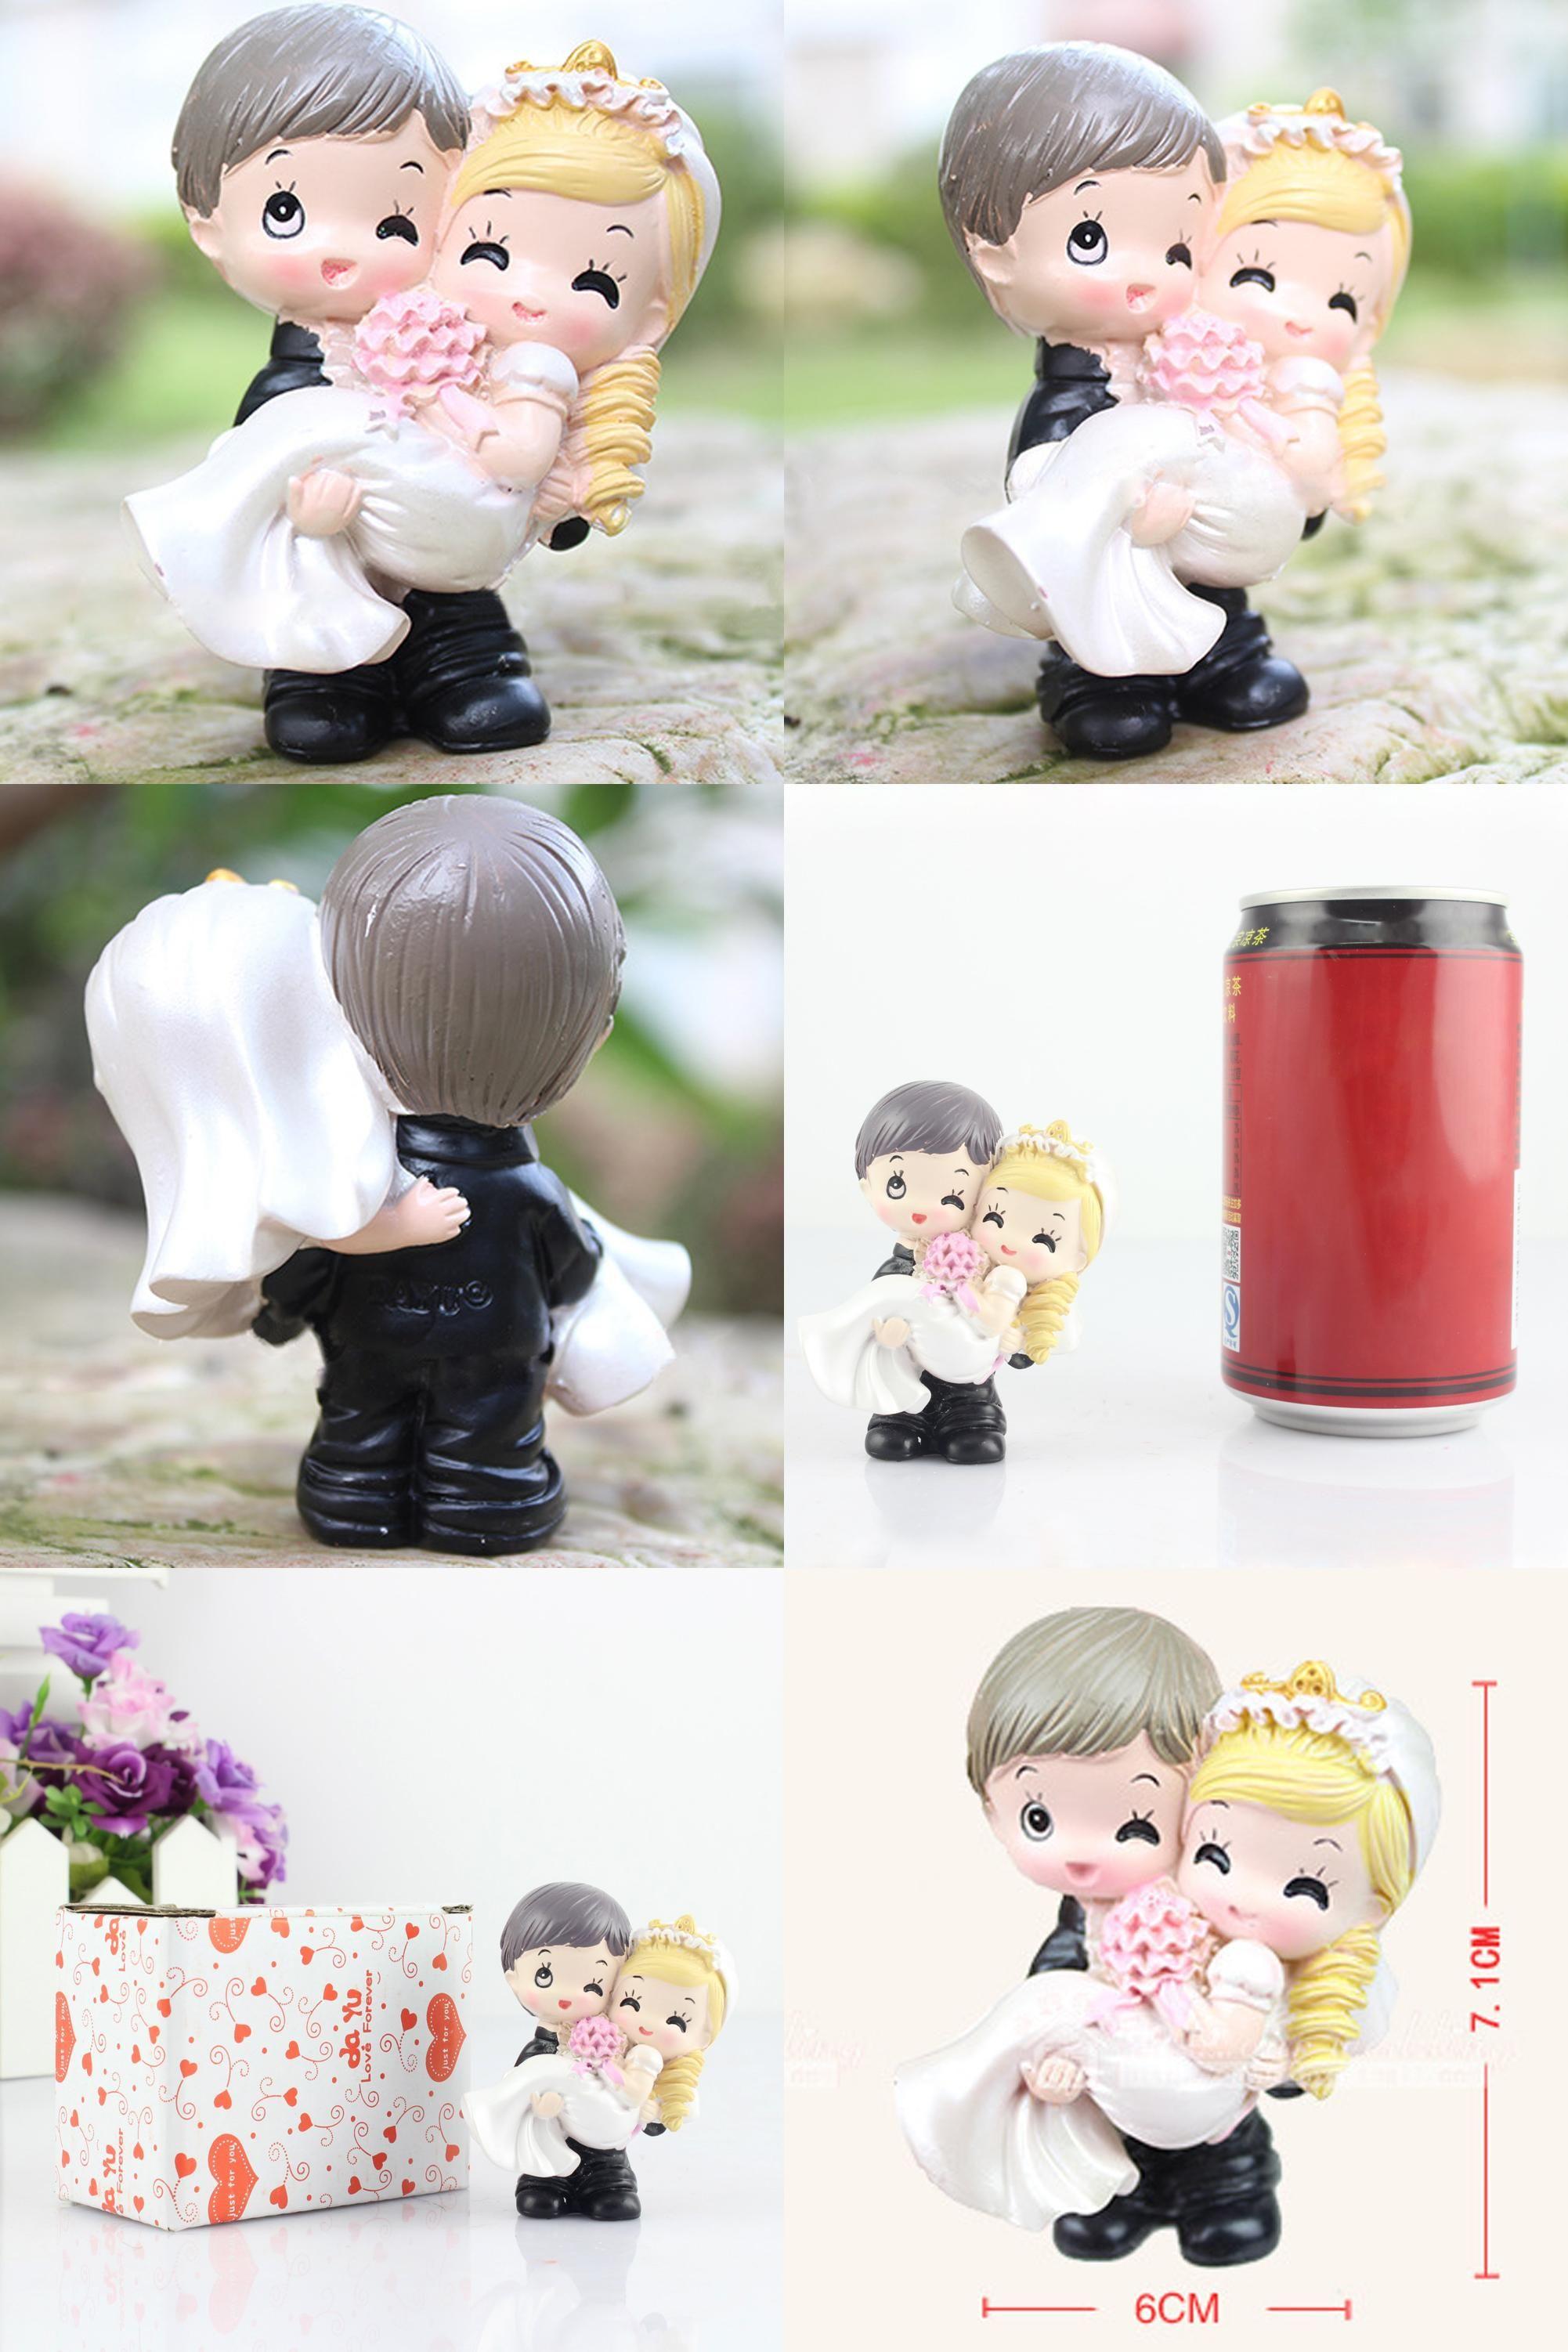 Visit to buy bride and groom loving couple figurine wedding cake